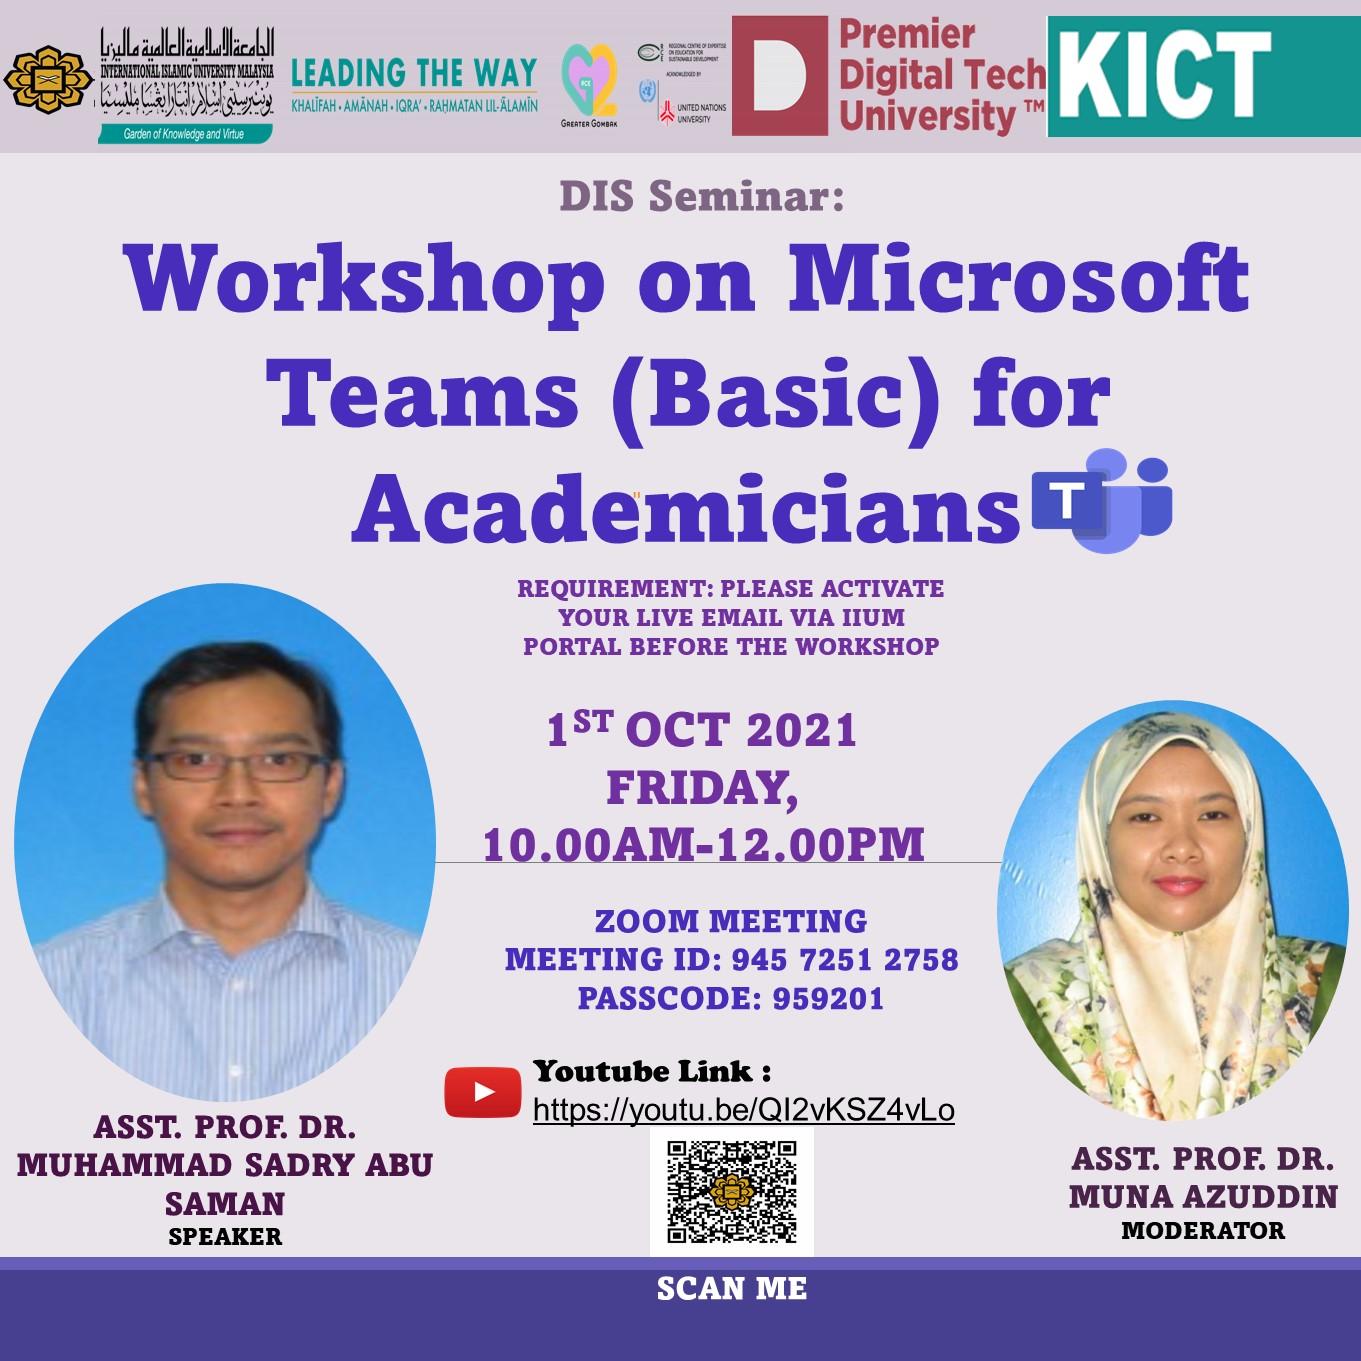 Workshop on Microsoft Teams (Basic) for Academicians